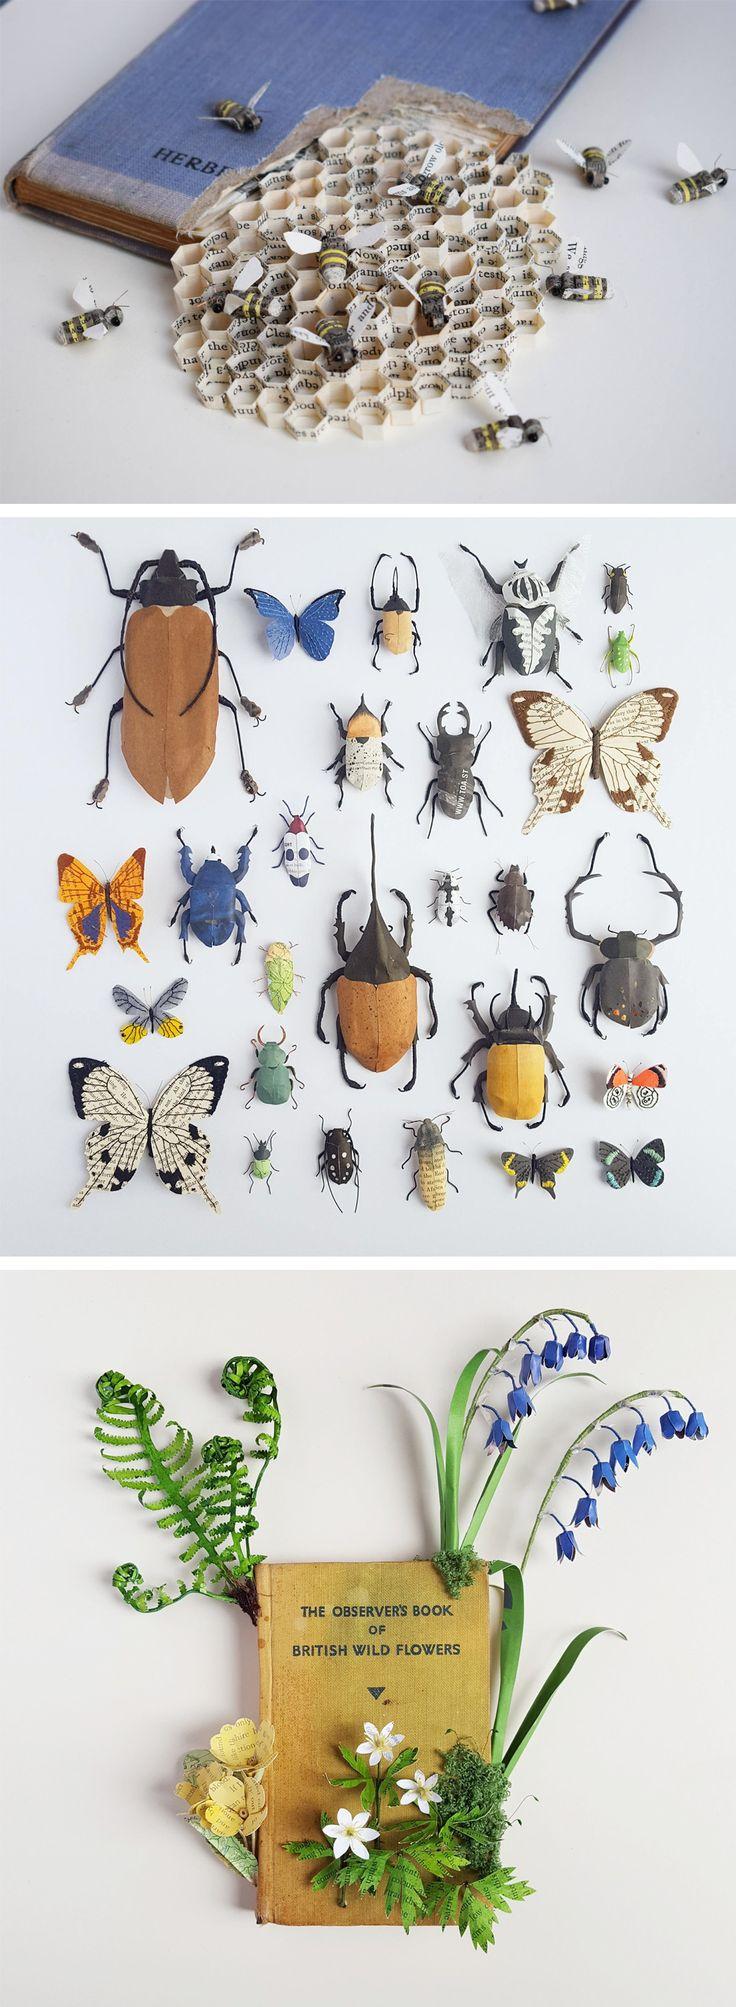 New Paper & Textile Wildlife Sculptures by Kate Kato